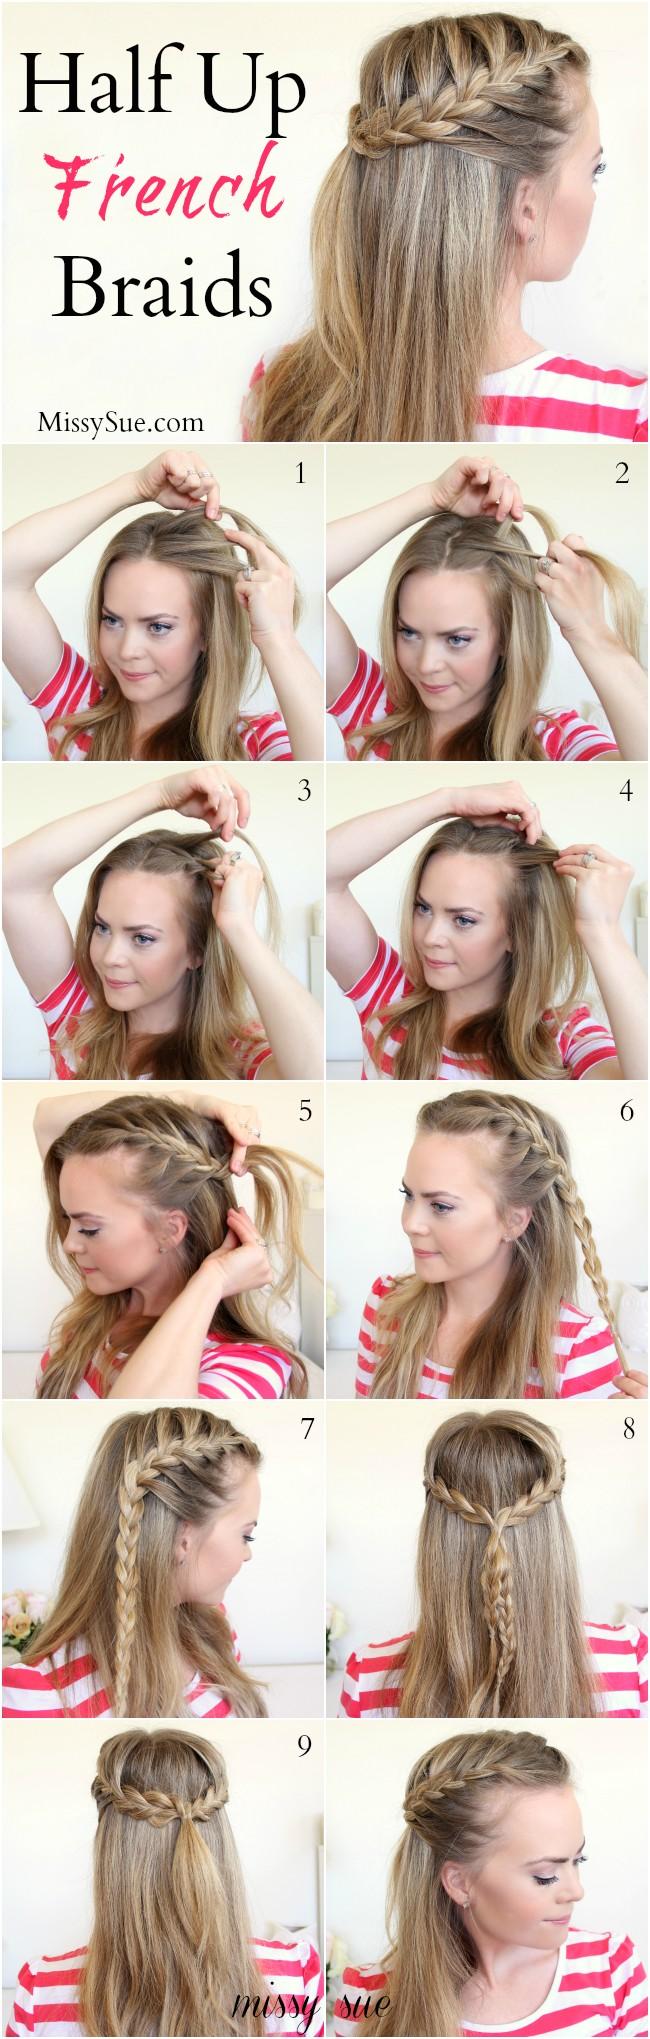 braid 11 half up french braids